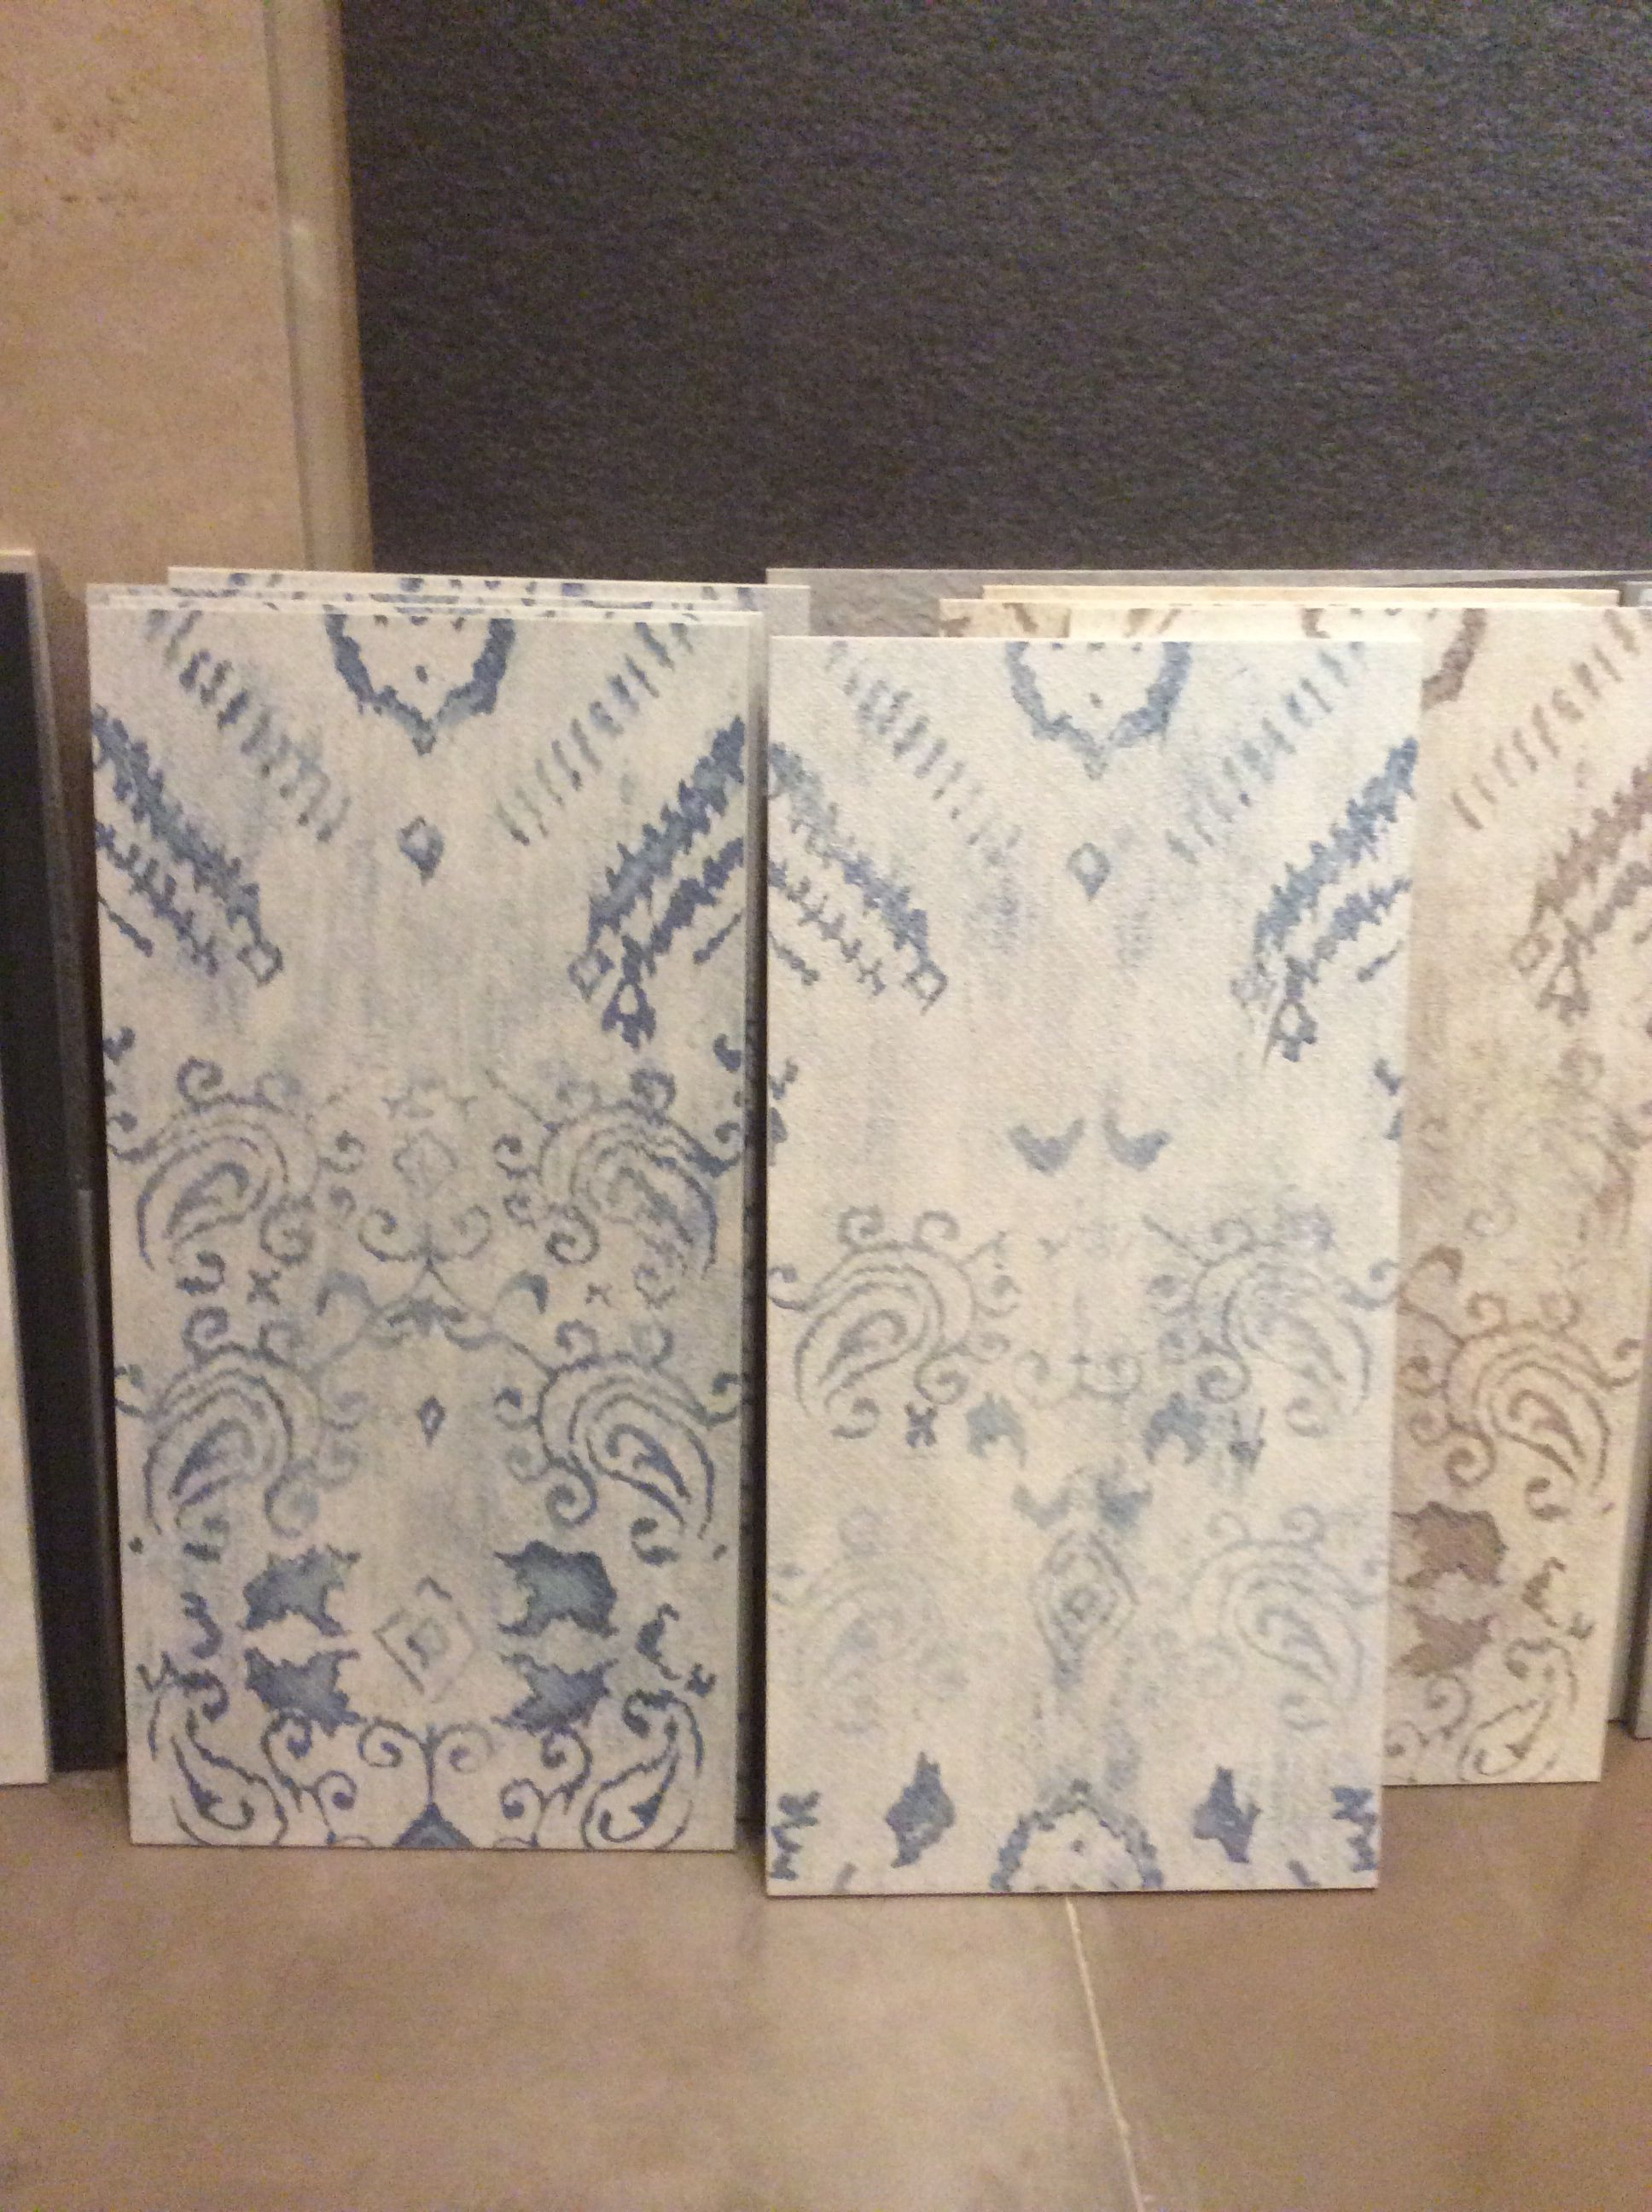 Bathroom Tiles Pale Blue And Beige Faded Pattern Decor Tile Bathroom Vintage World Maps Tiles